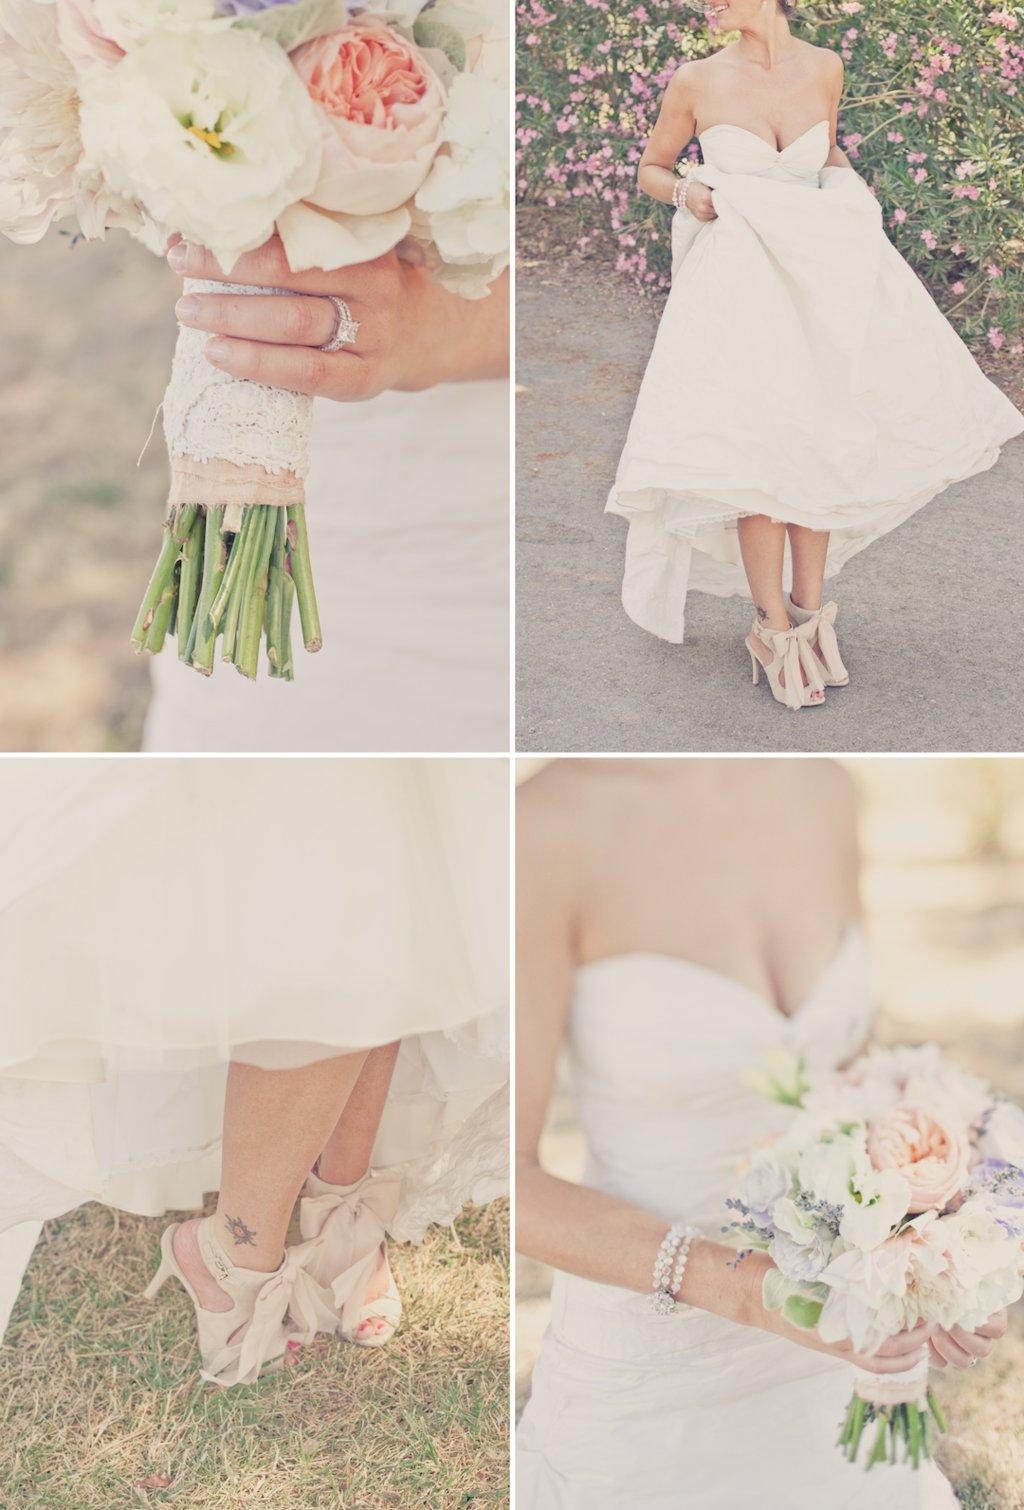 Elegant-outdoor-wedding-inspiration-peach-lavender-cream-bridal-flowers-shoes.full